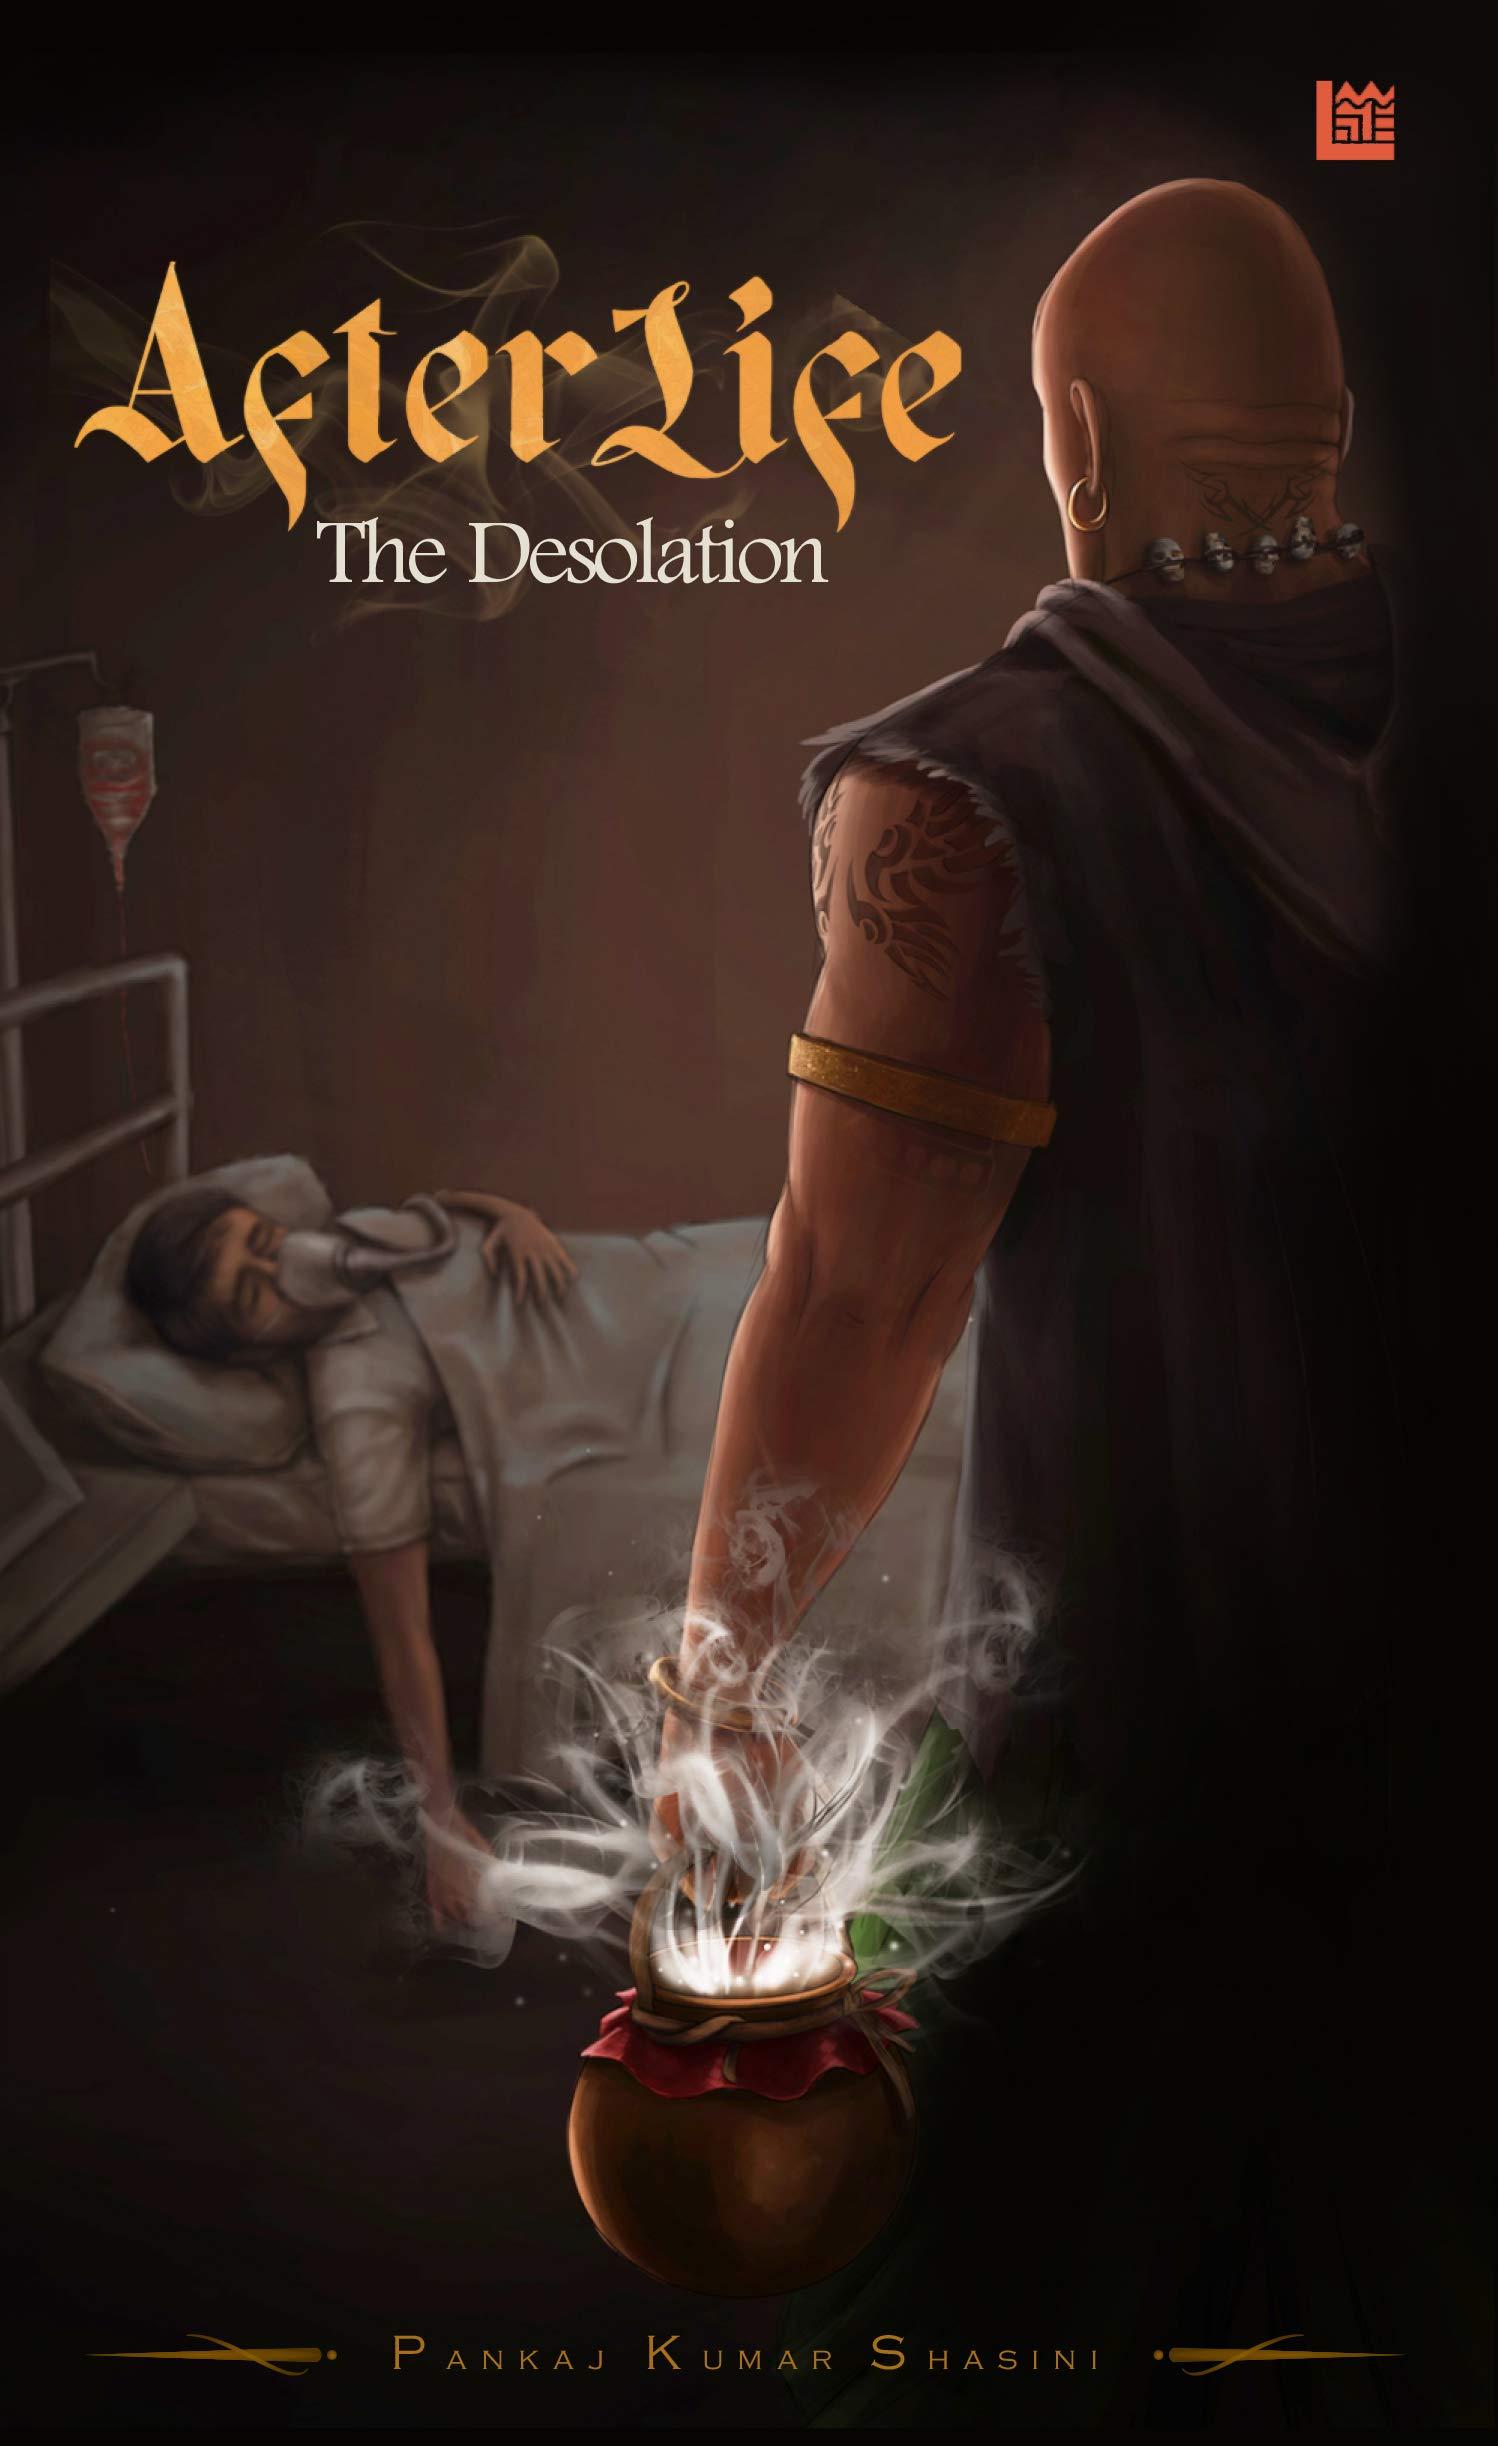 AfterLife - The Desolation by Pankaj Kumar Shasini